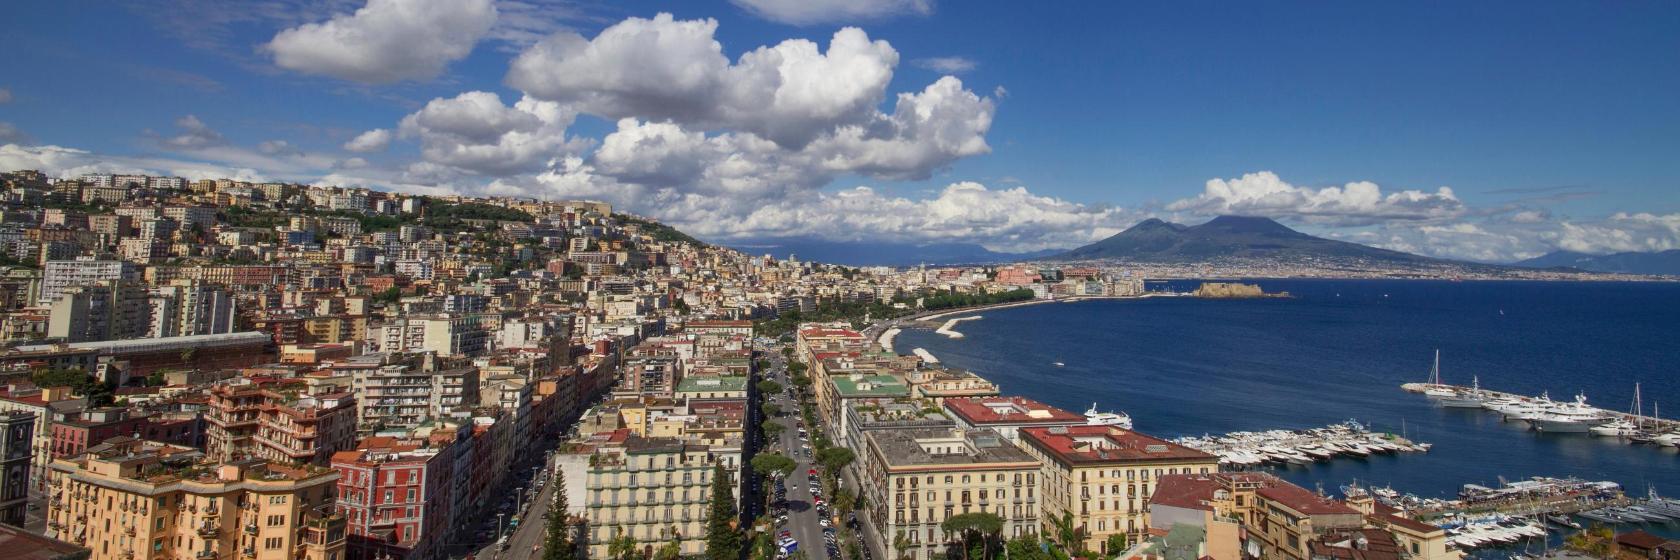 Naples, Italy Hotels